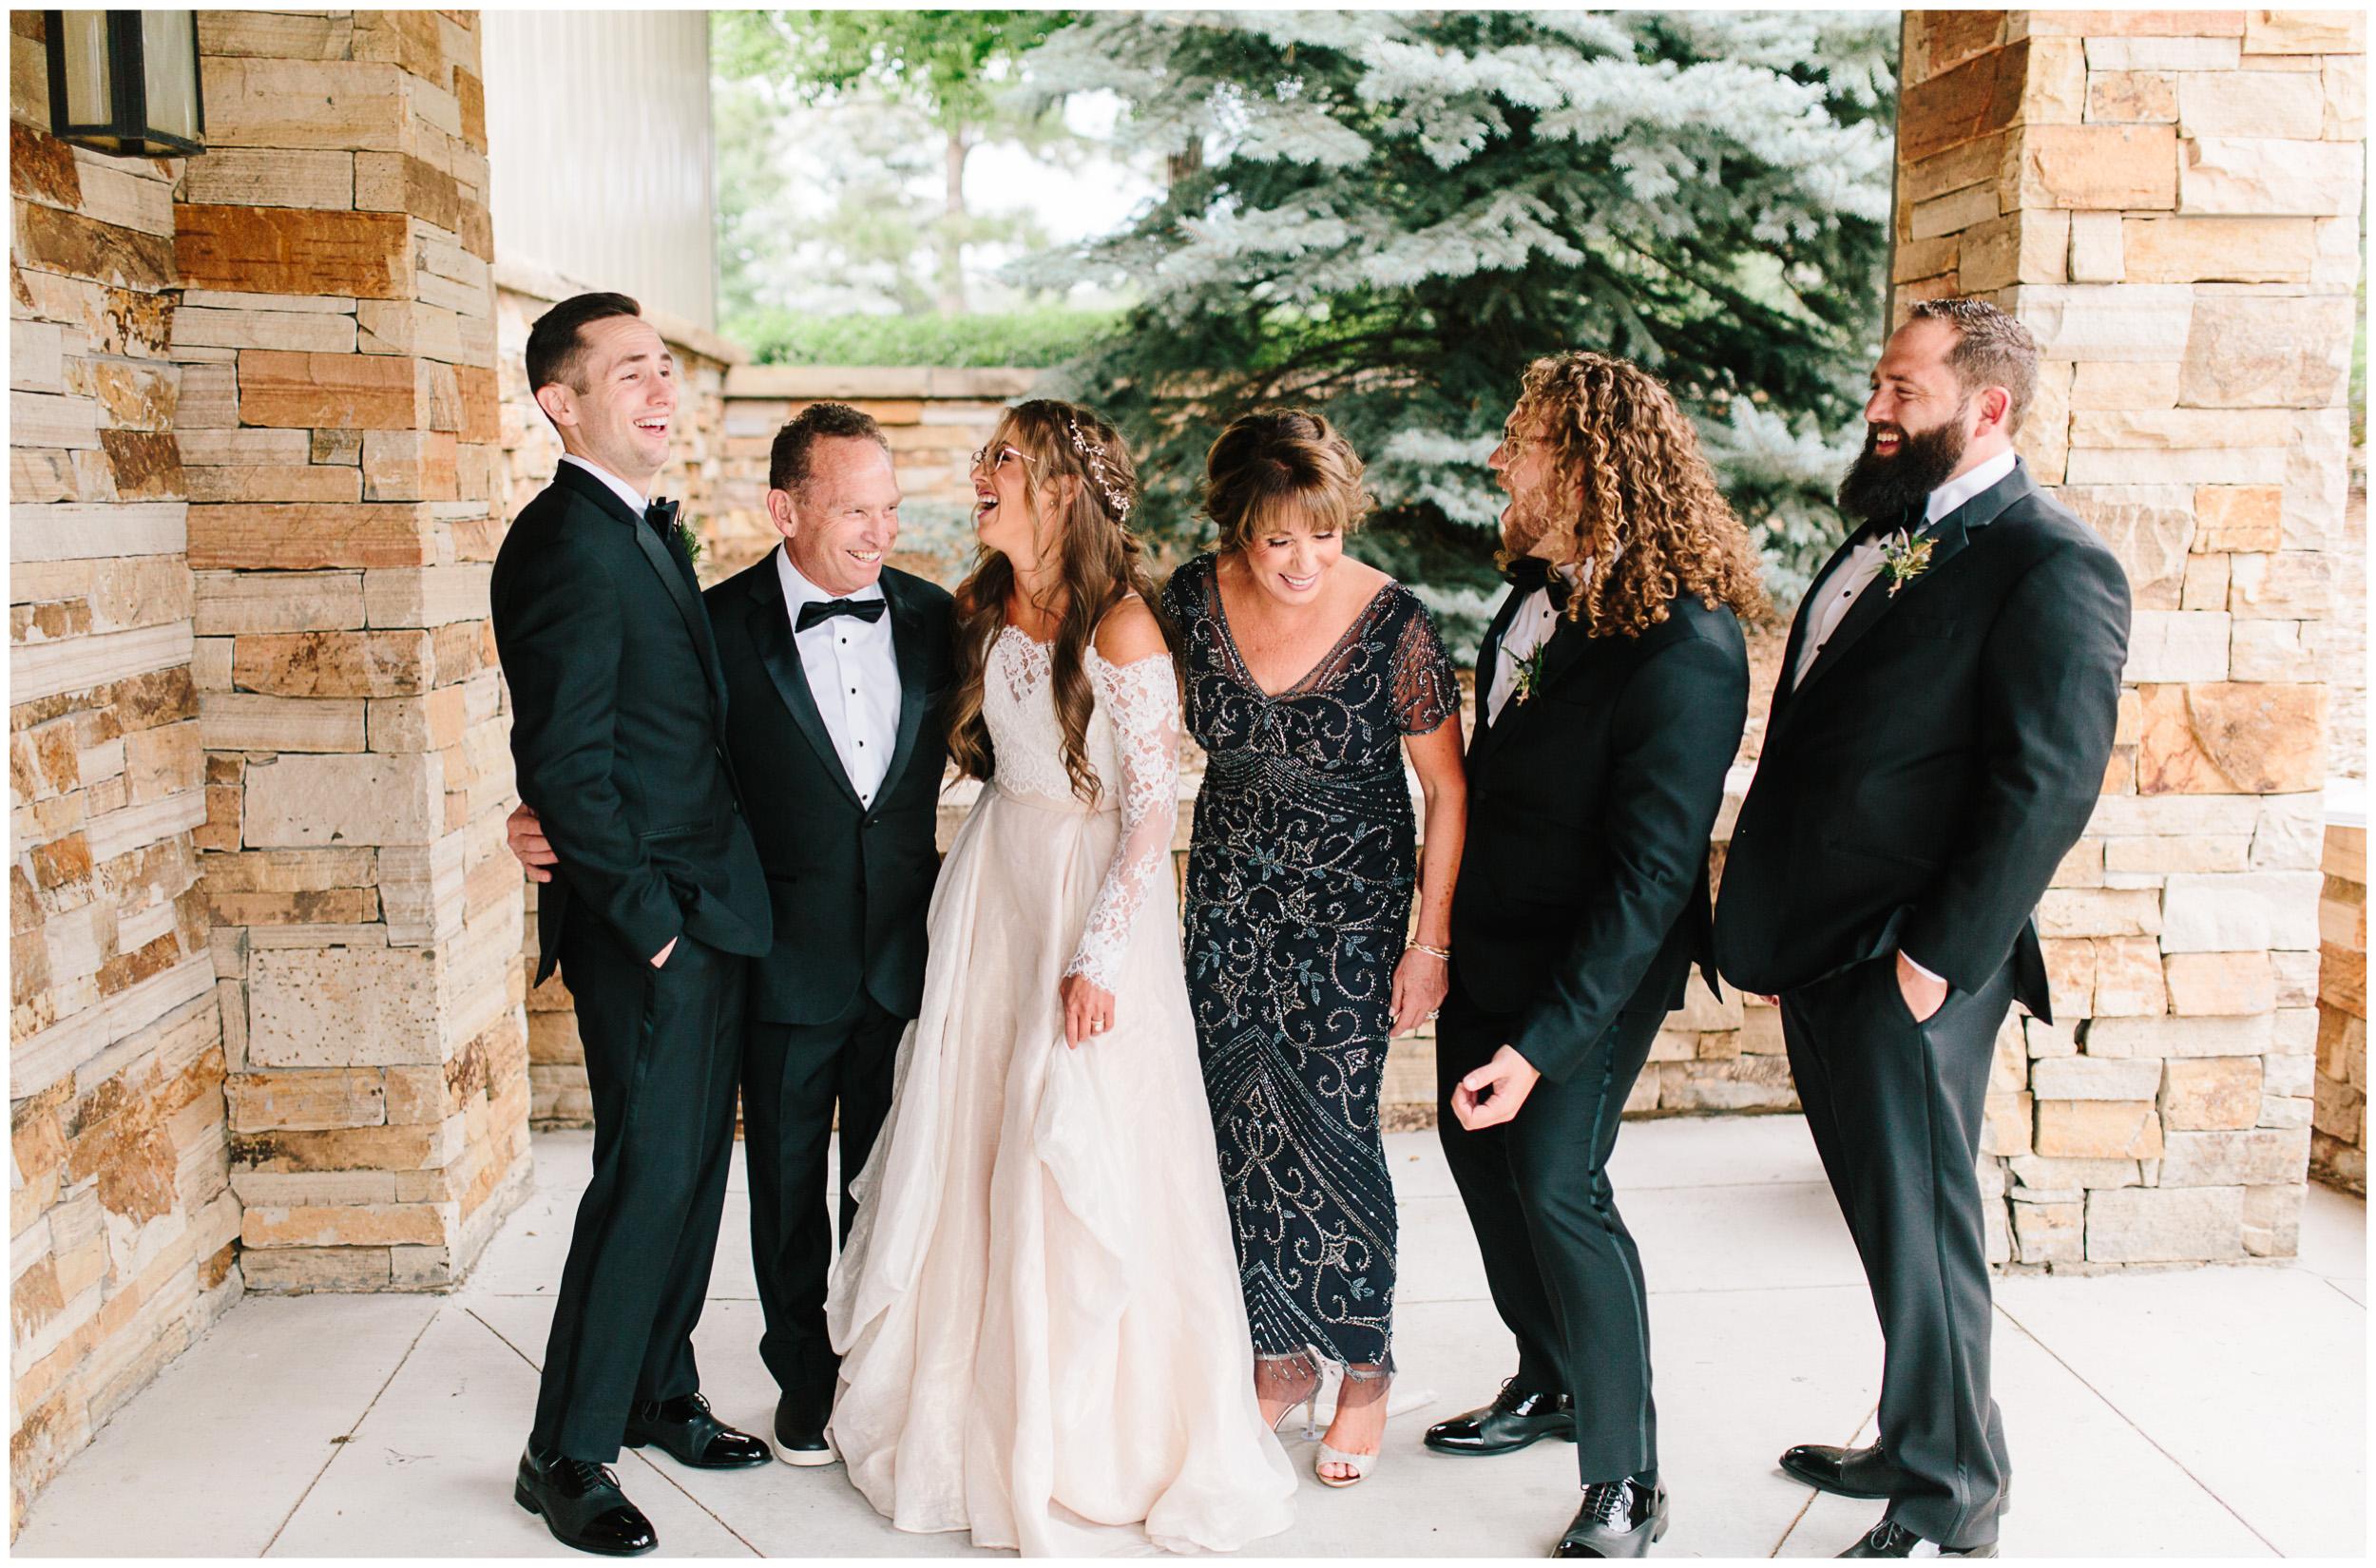 spruce_mountain_ranch_wedding_13.jpg